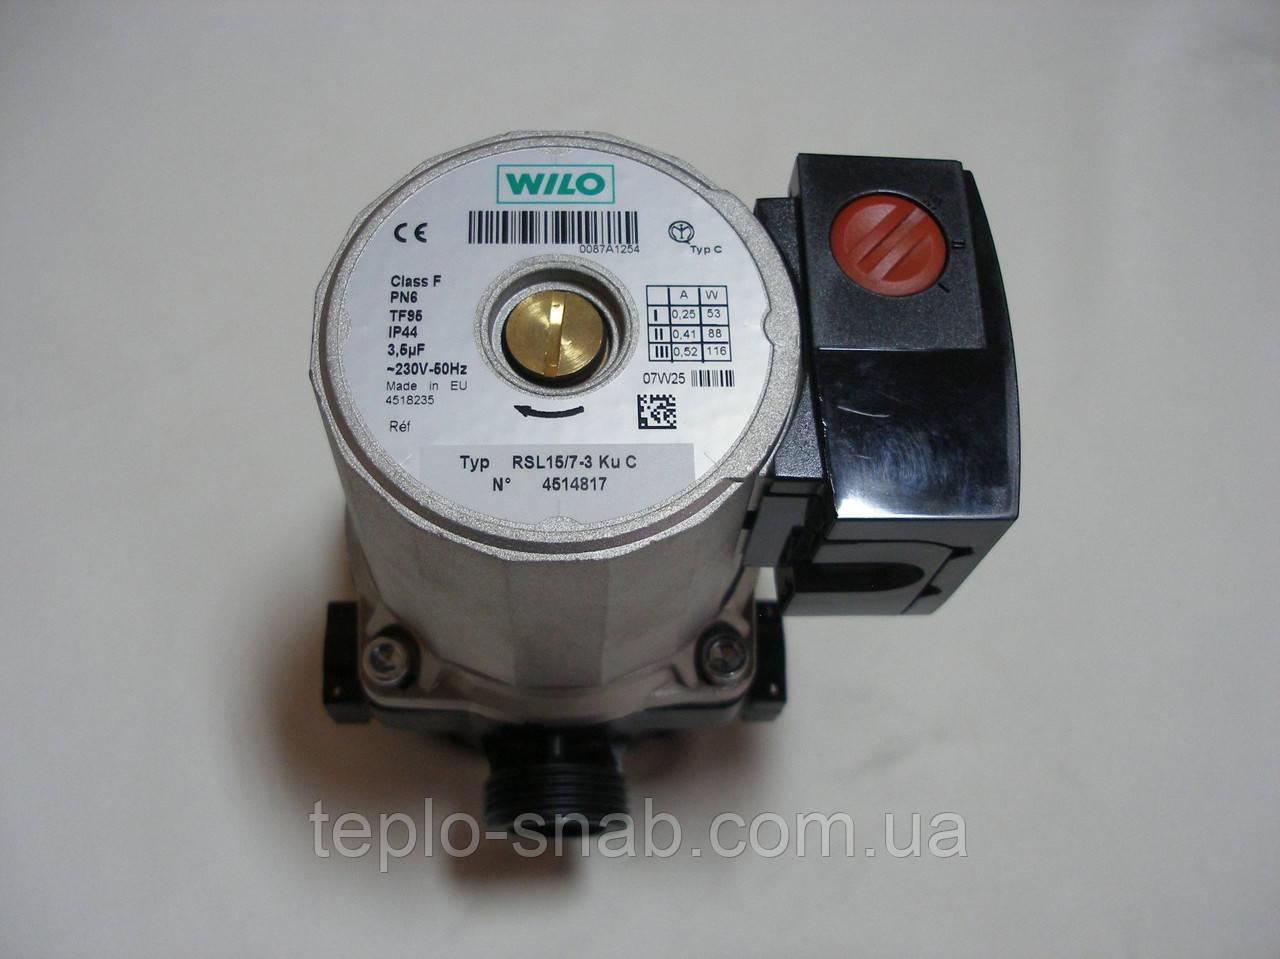 Циркуляционный насос WILO RSL 15/7 (в сборе) газового навесного котла Fondital NIAS - LIBRA Dual BTFS 24-28-32 kw. 6CIRCOLA10